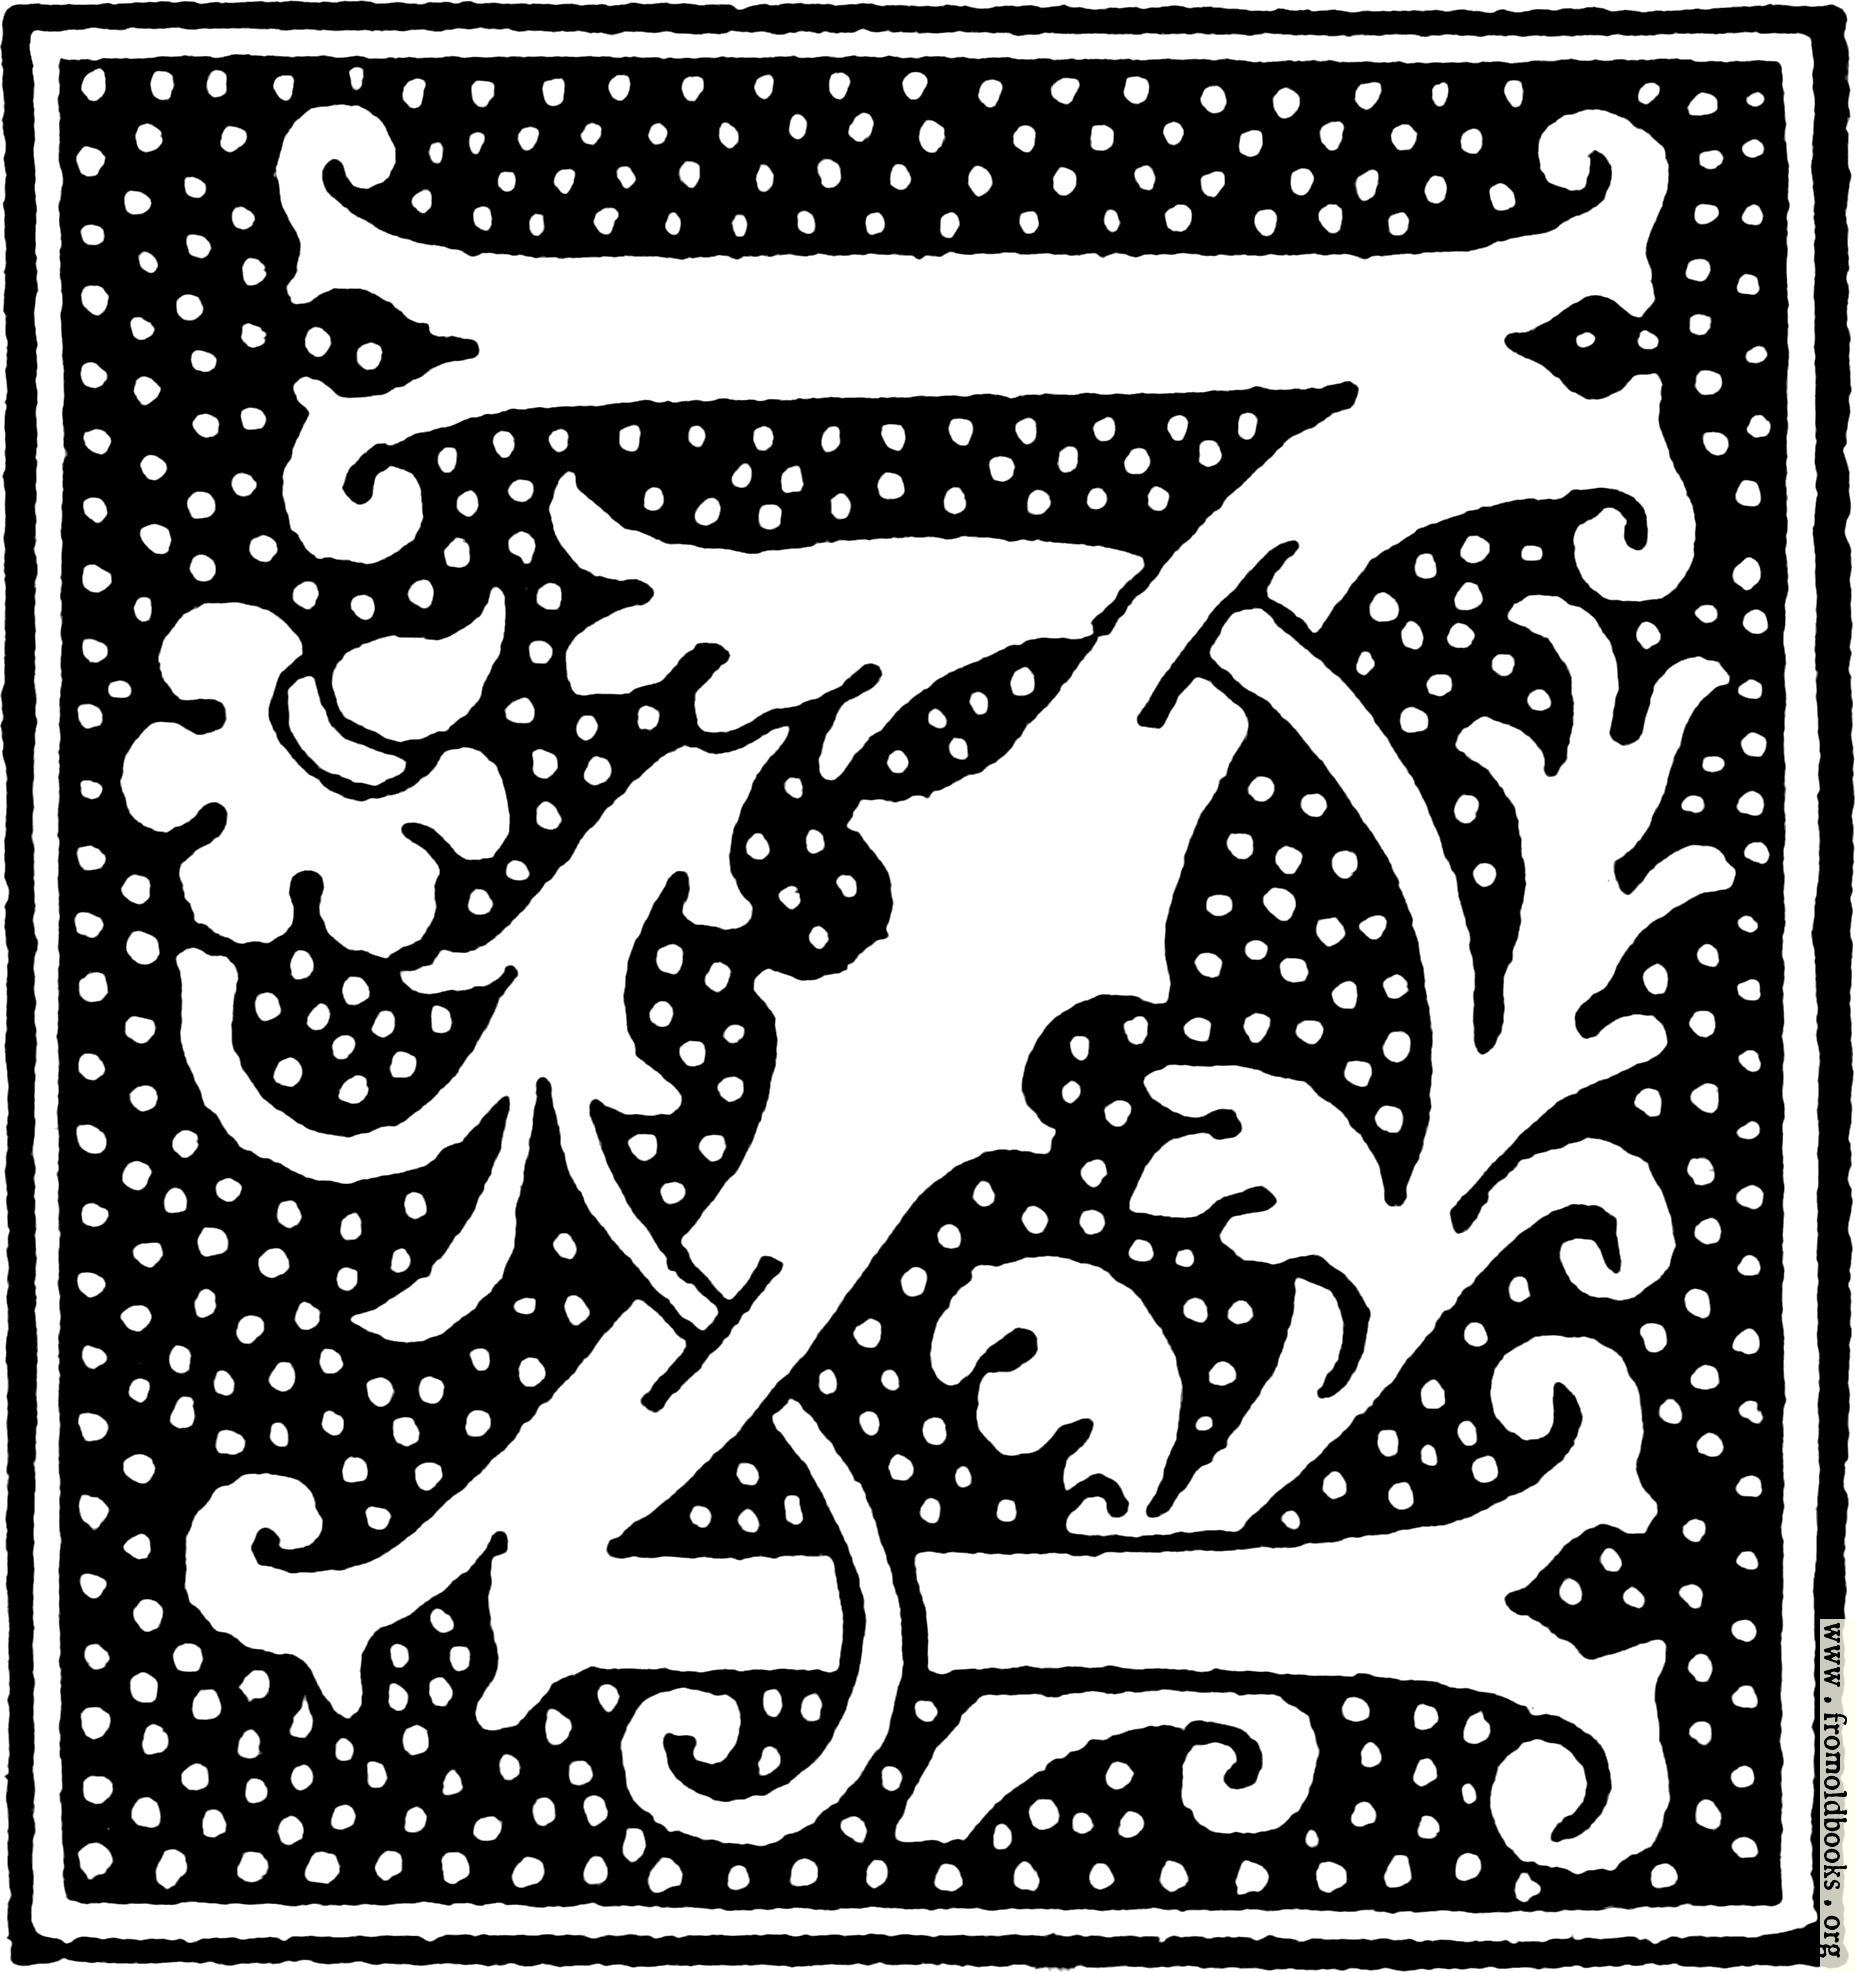 Calligraphy Letter Z   www.pixshark.com - Images Galleries ...